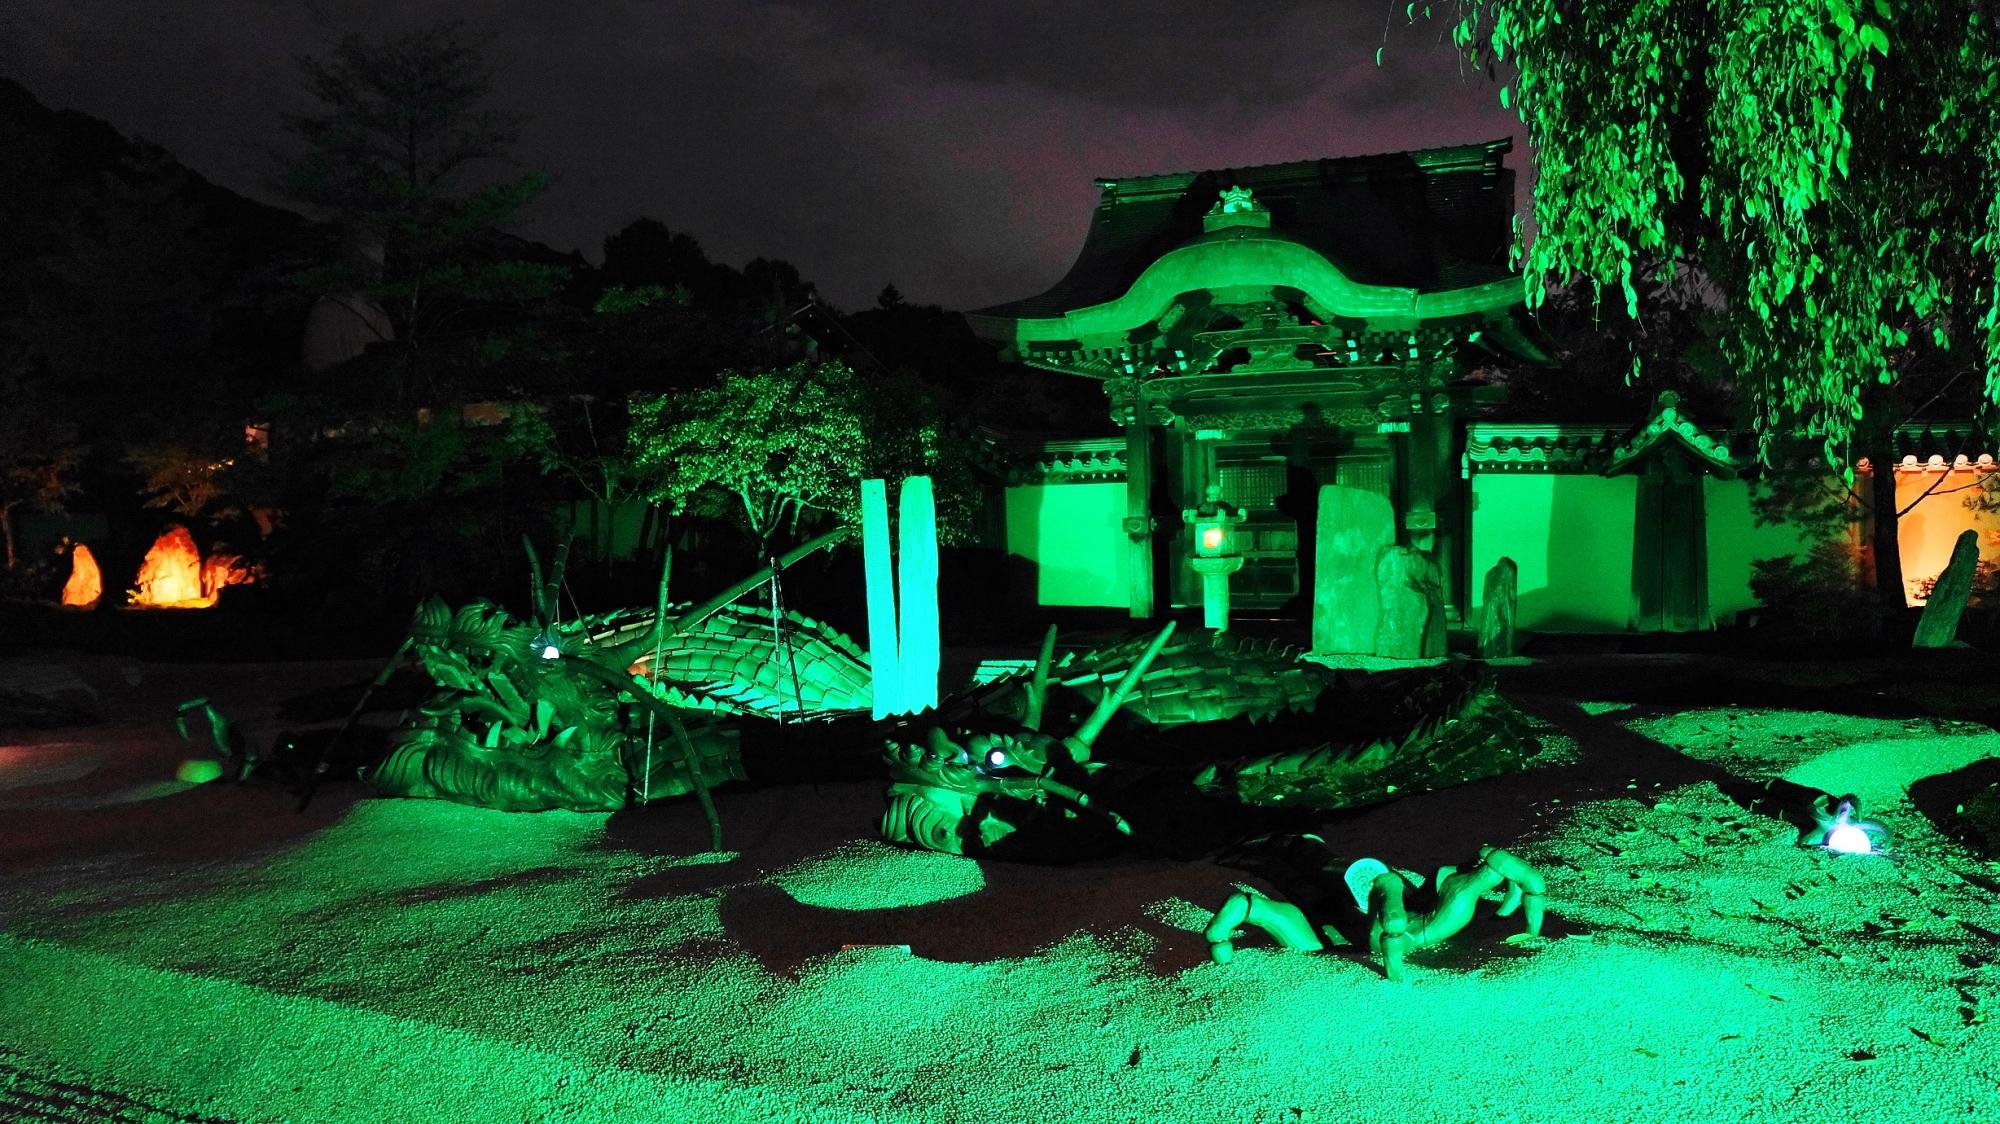 kyoto Kodai-ji Temple Hojo-Garden 龍 ライトアップ 高台寺 方丈庭園